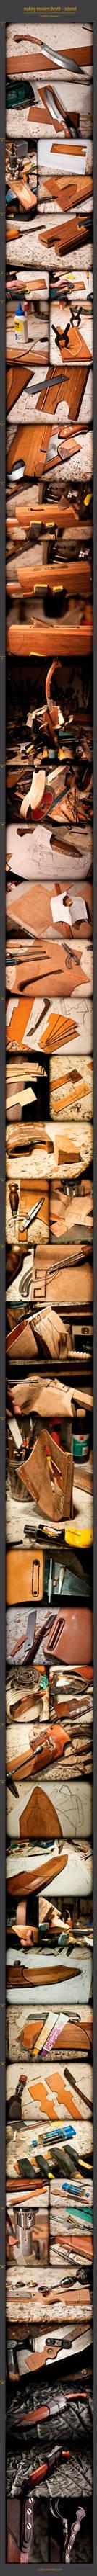 wooden sheath tutorial